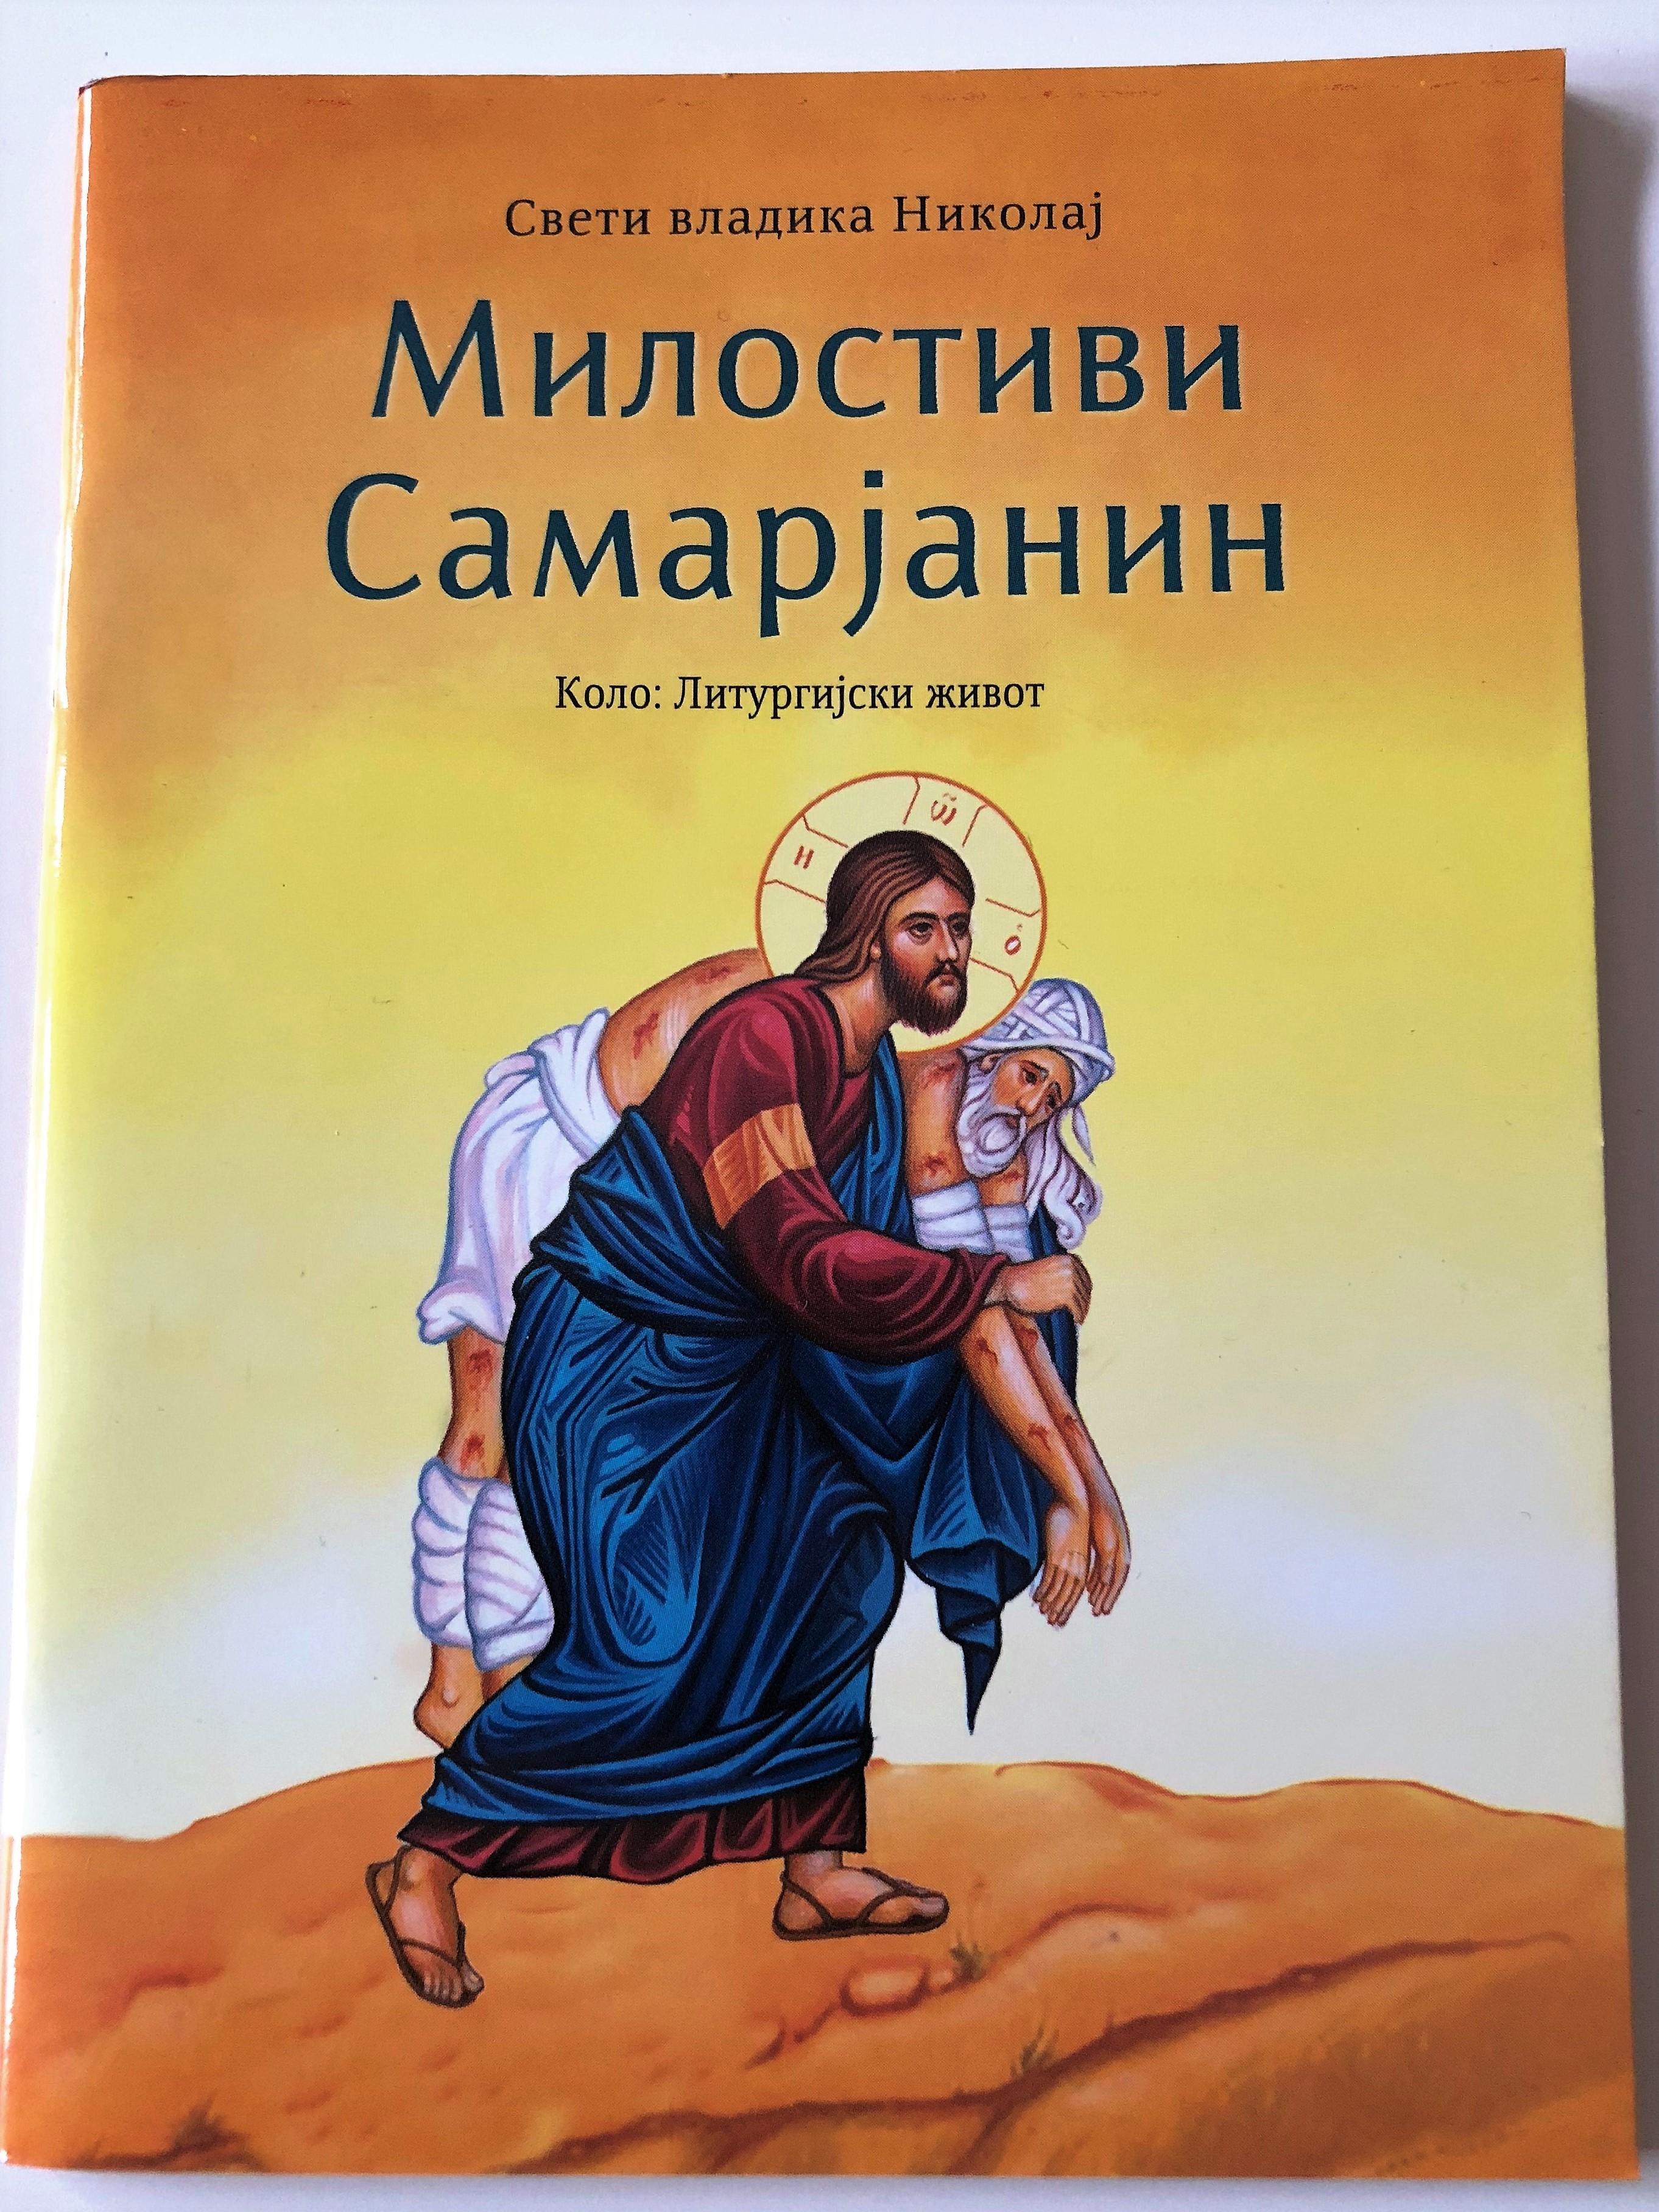 serbian-the-merciful-samaritan-childrens-book-1-.jpg